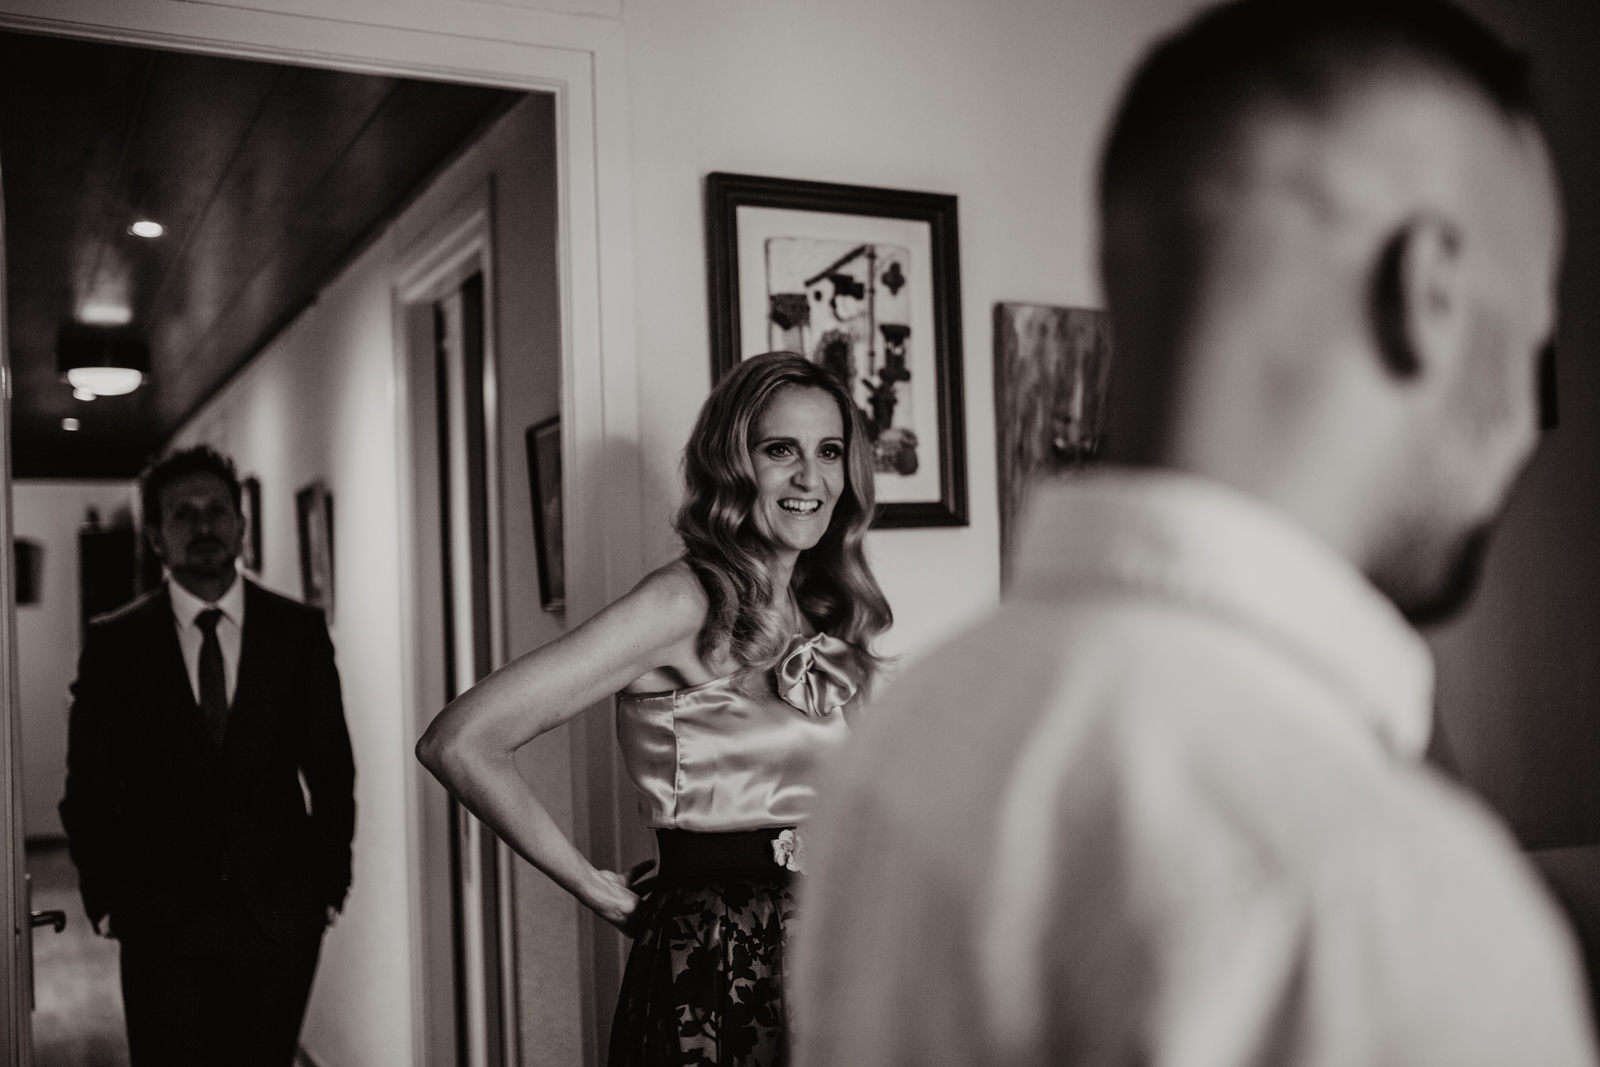 thenortherngirlphotography_photography_thenortherngirl_rebeccascabros_wedding_weddingphotography_weddingphotographer_barcelona_bodaenbarcelona_bodaenmaselmarti_bodarogeryvane-163.jpg